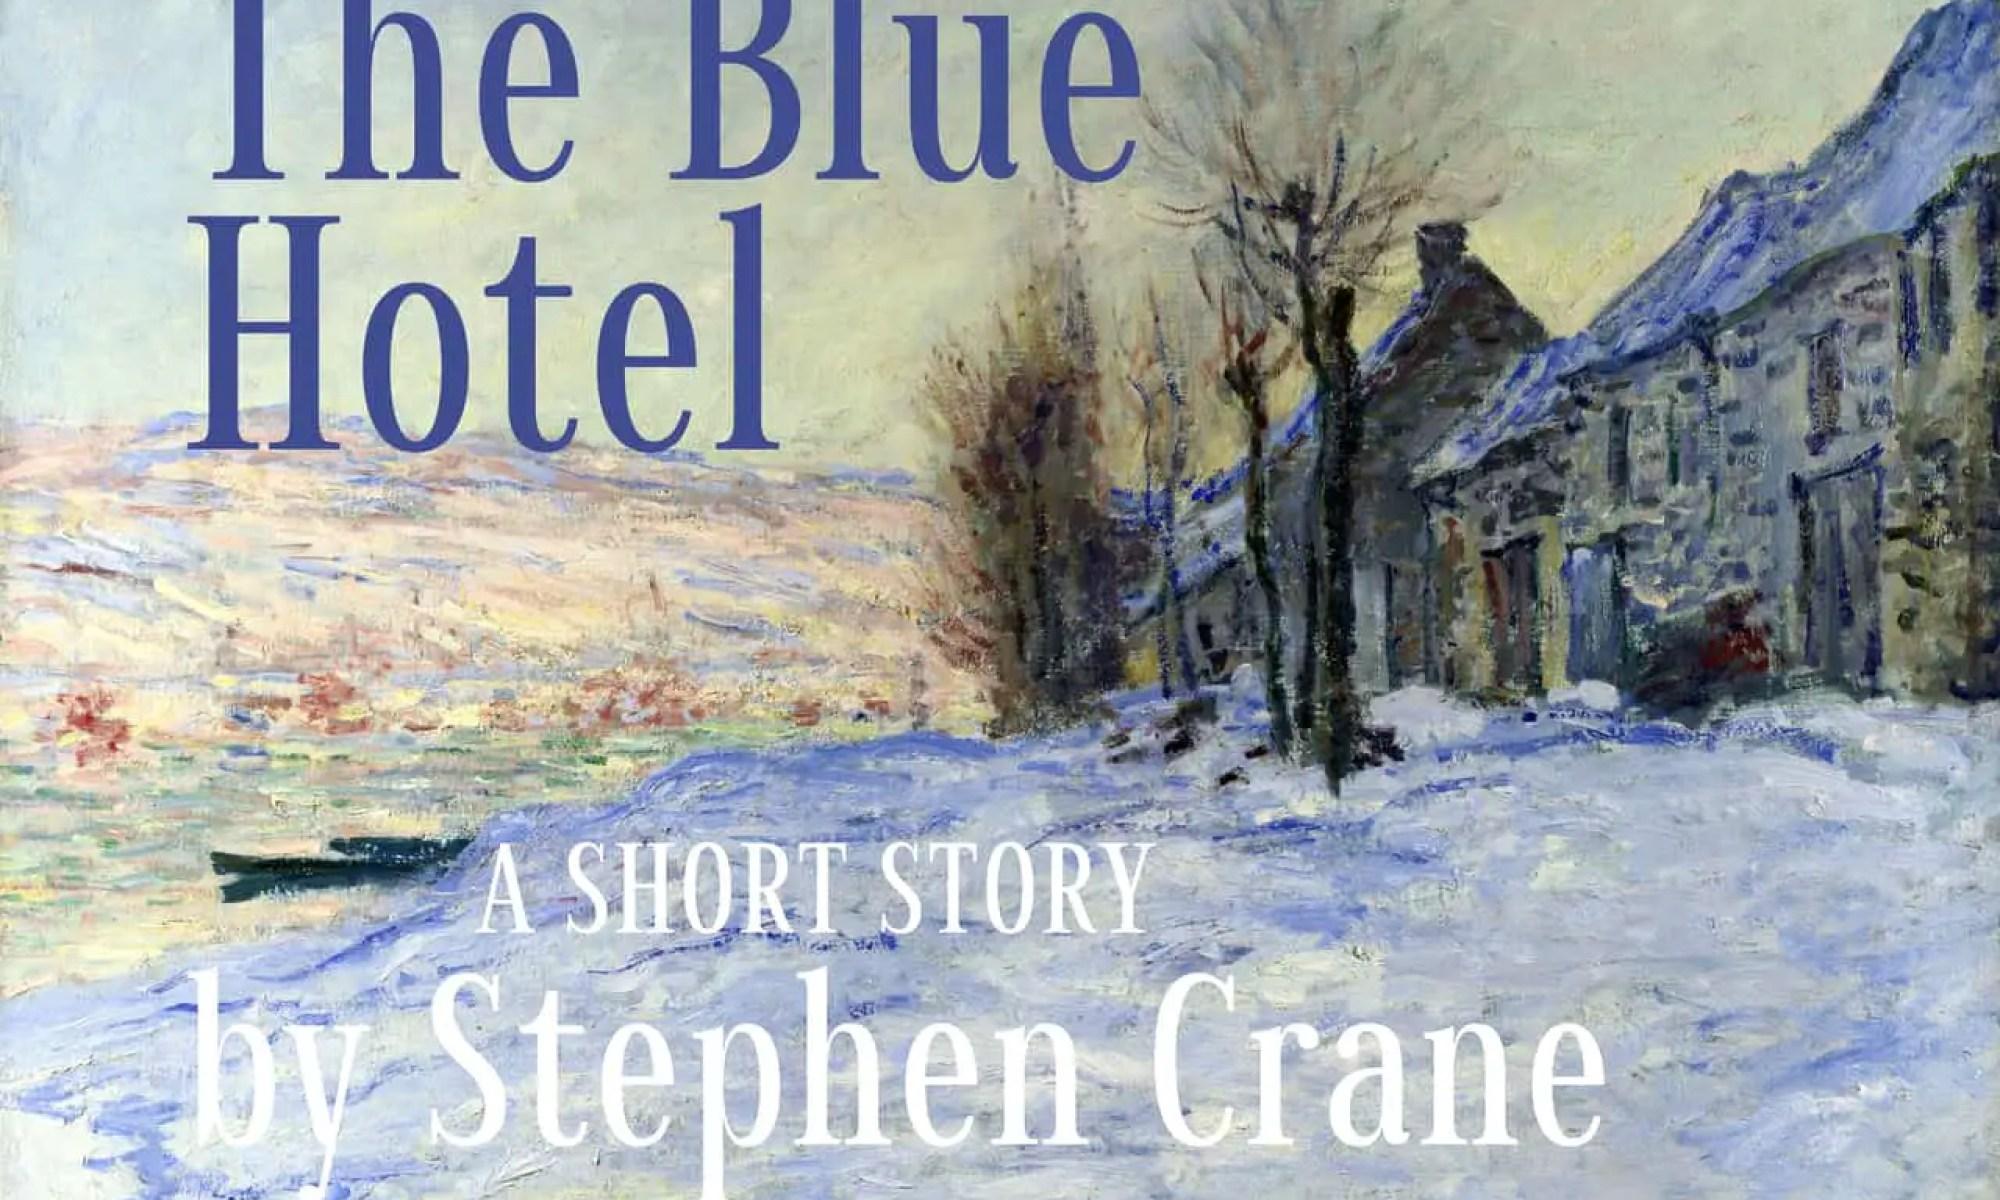 THE BLUE HOTEL stephen crane